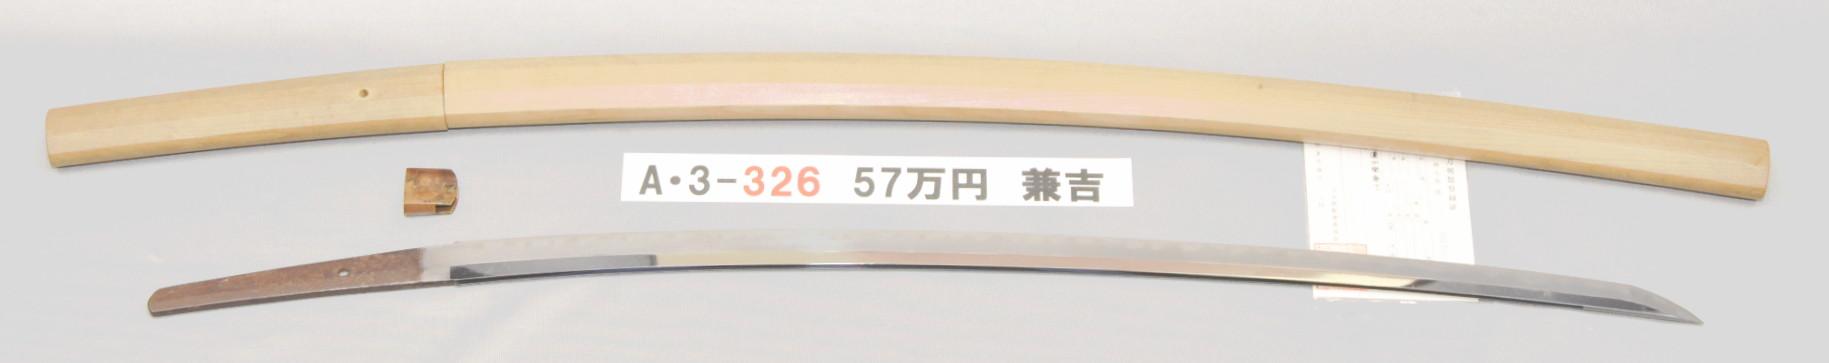 A3326